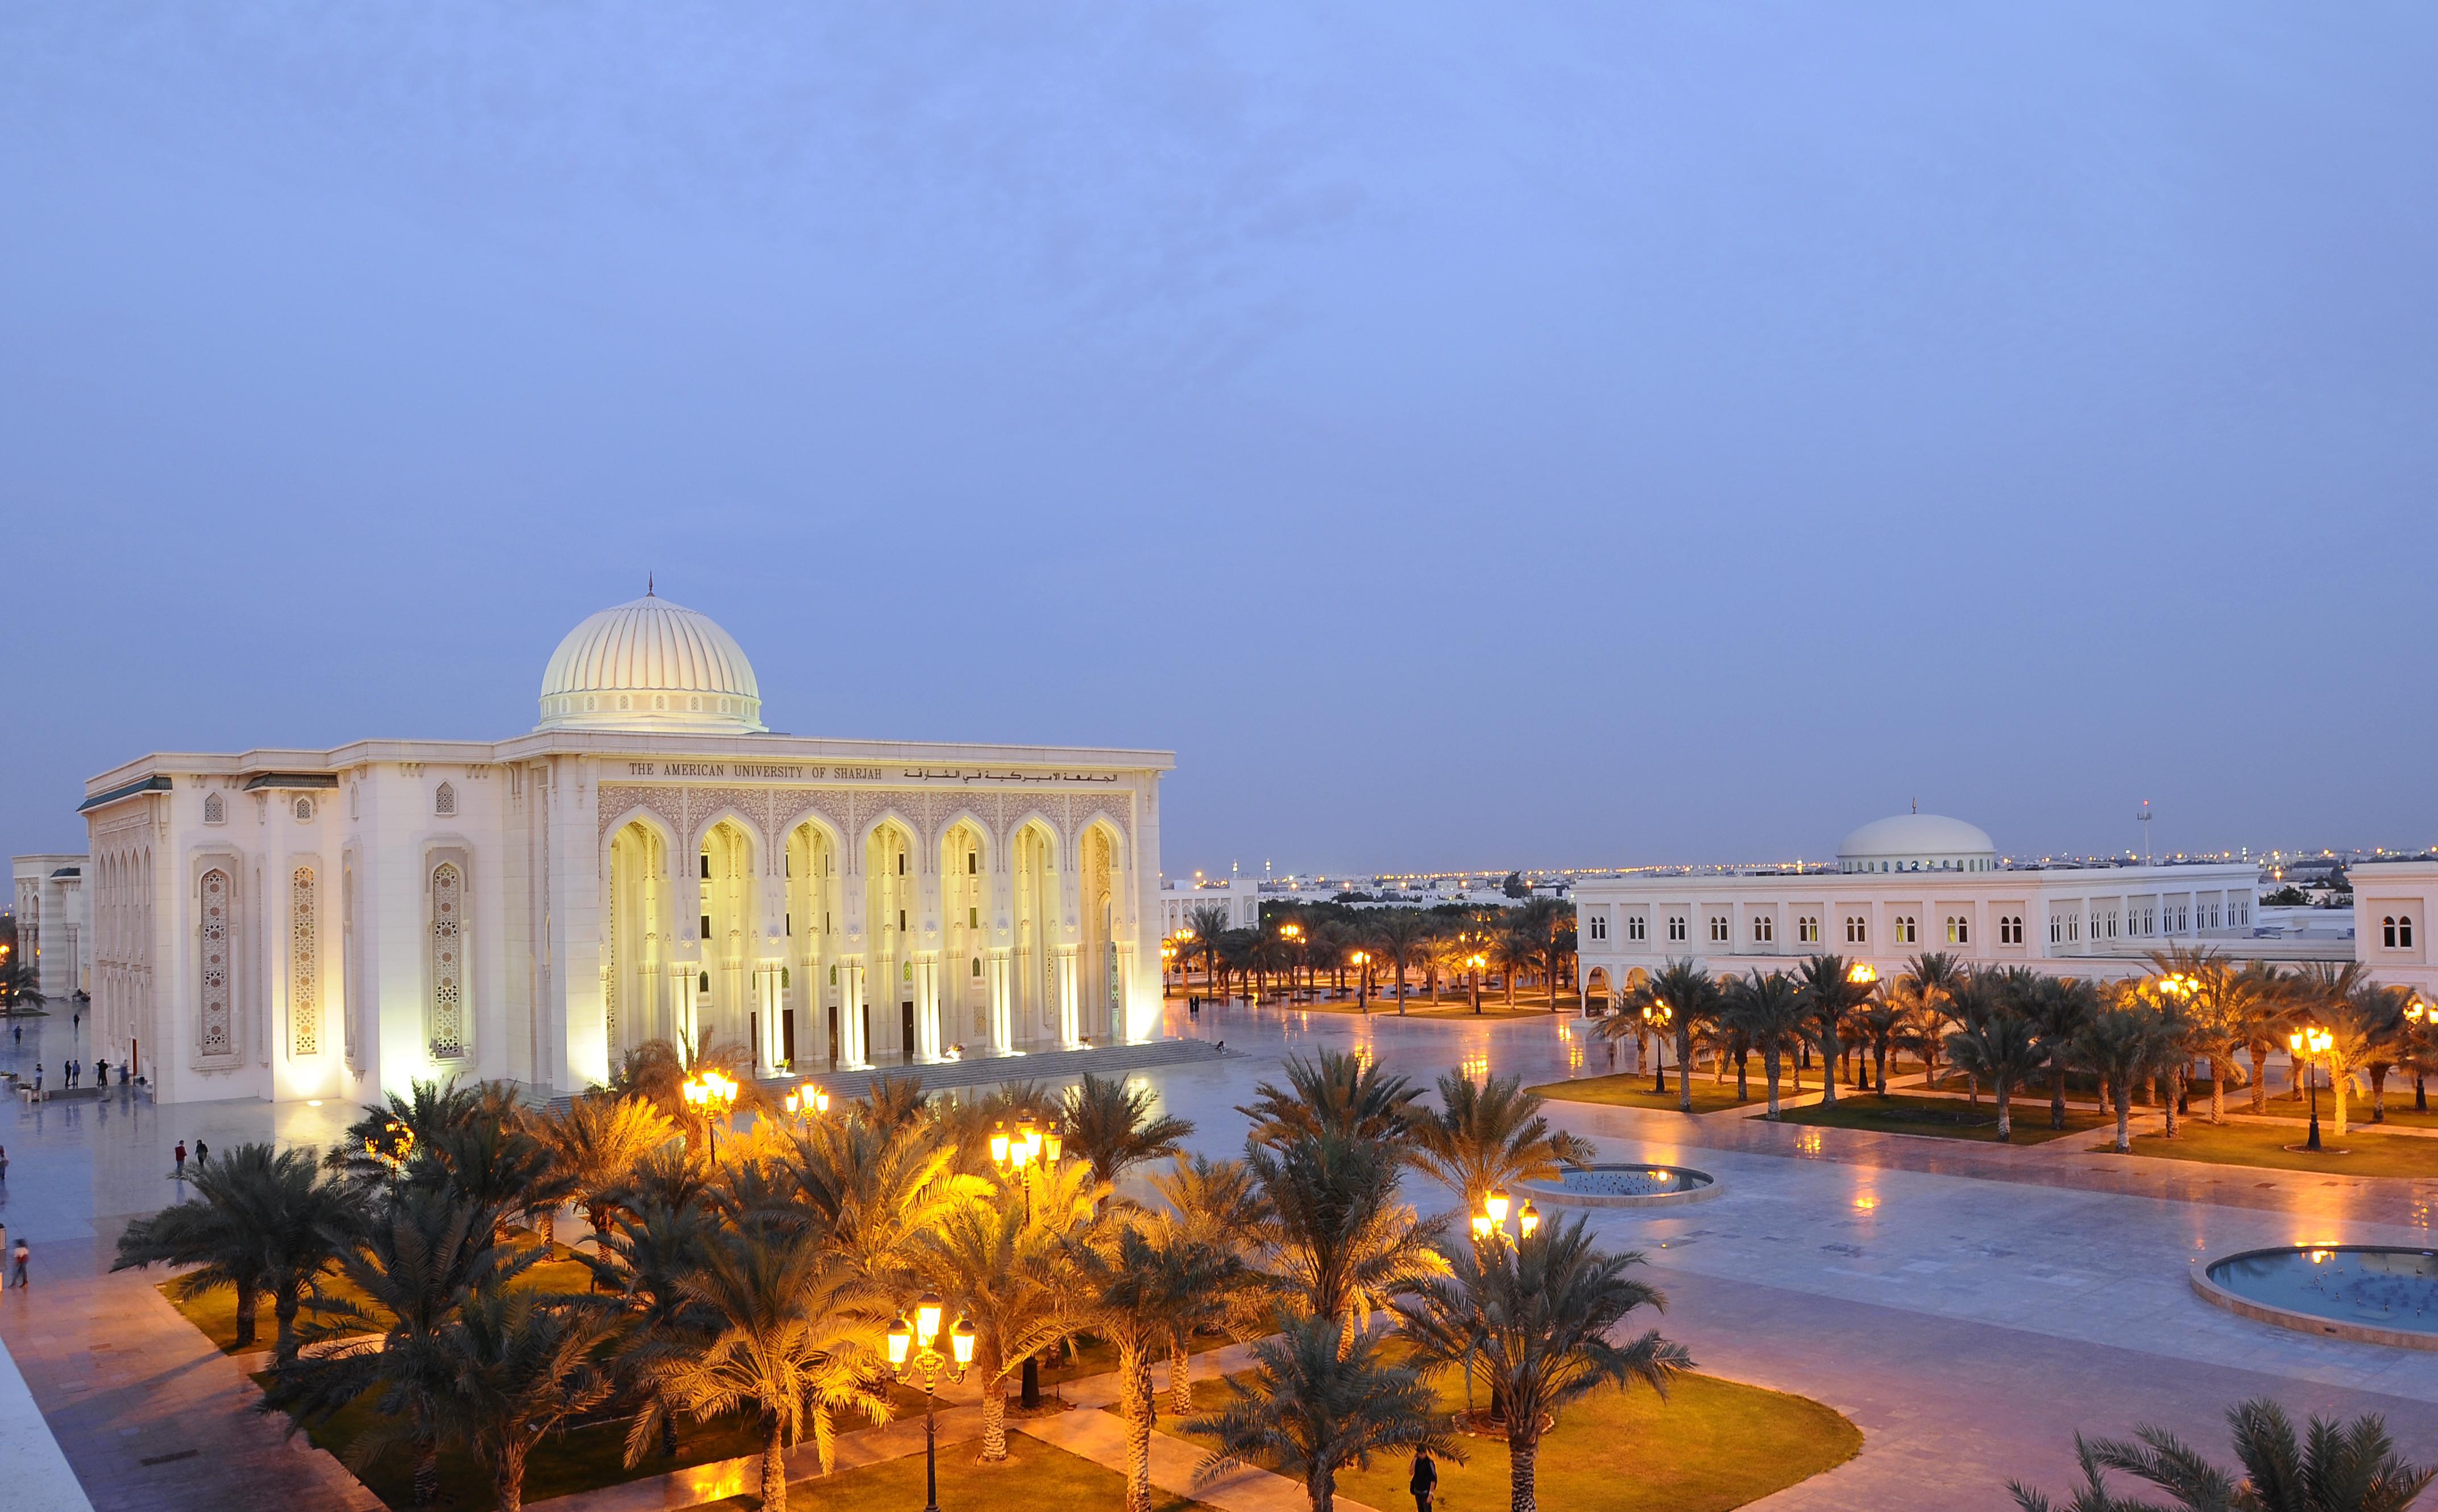 American University of Sharjah (1)-1.jpg